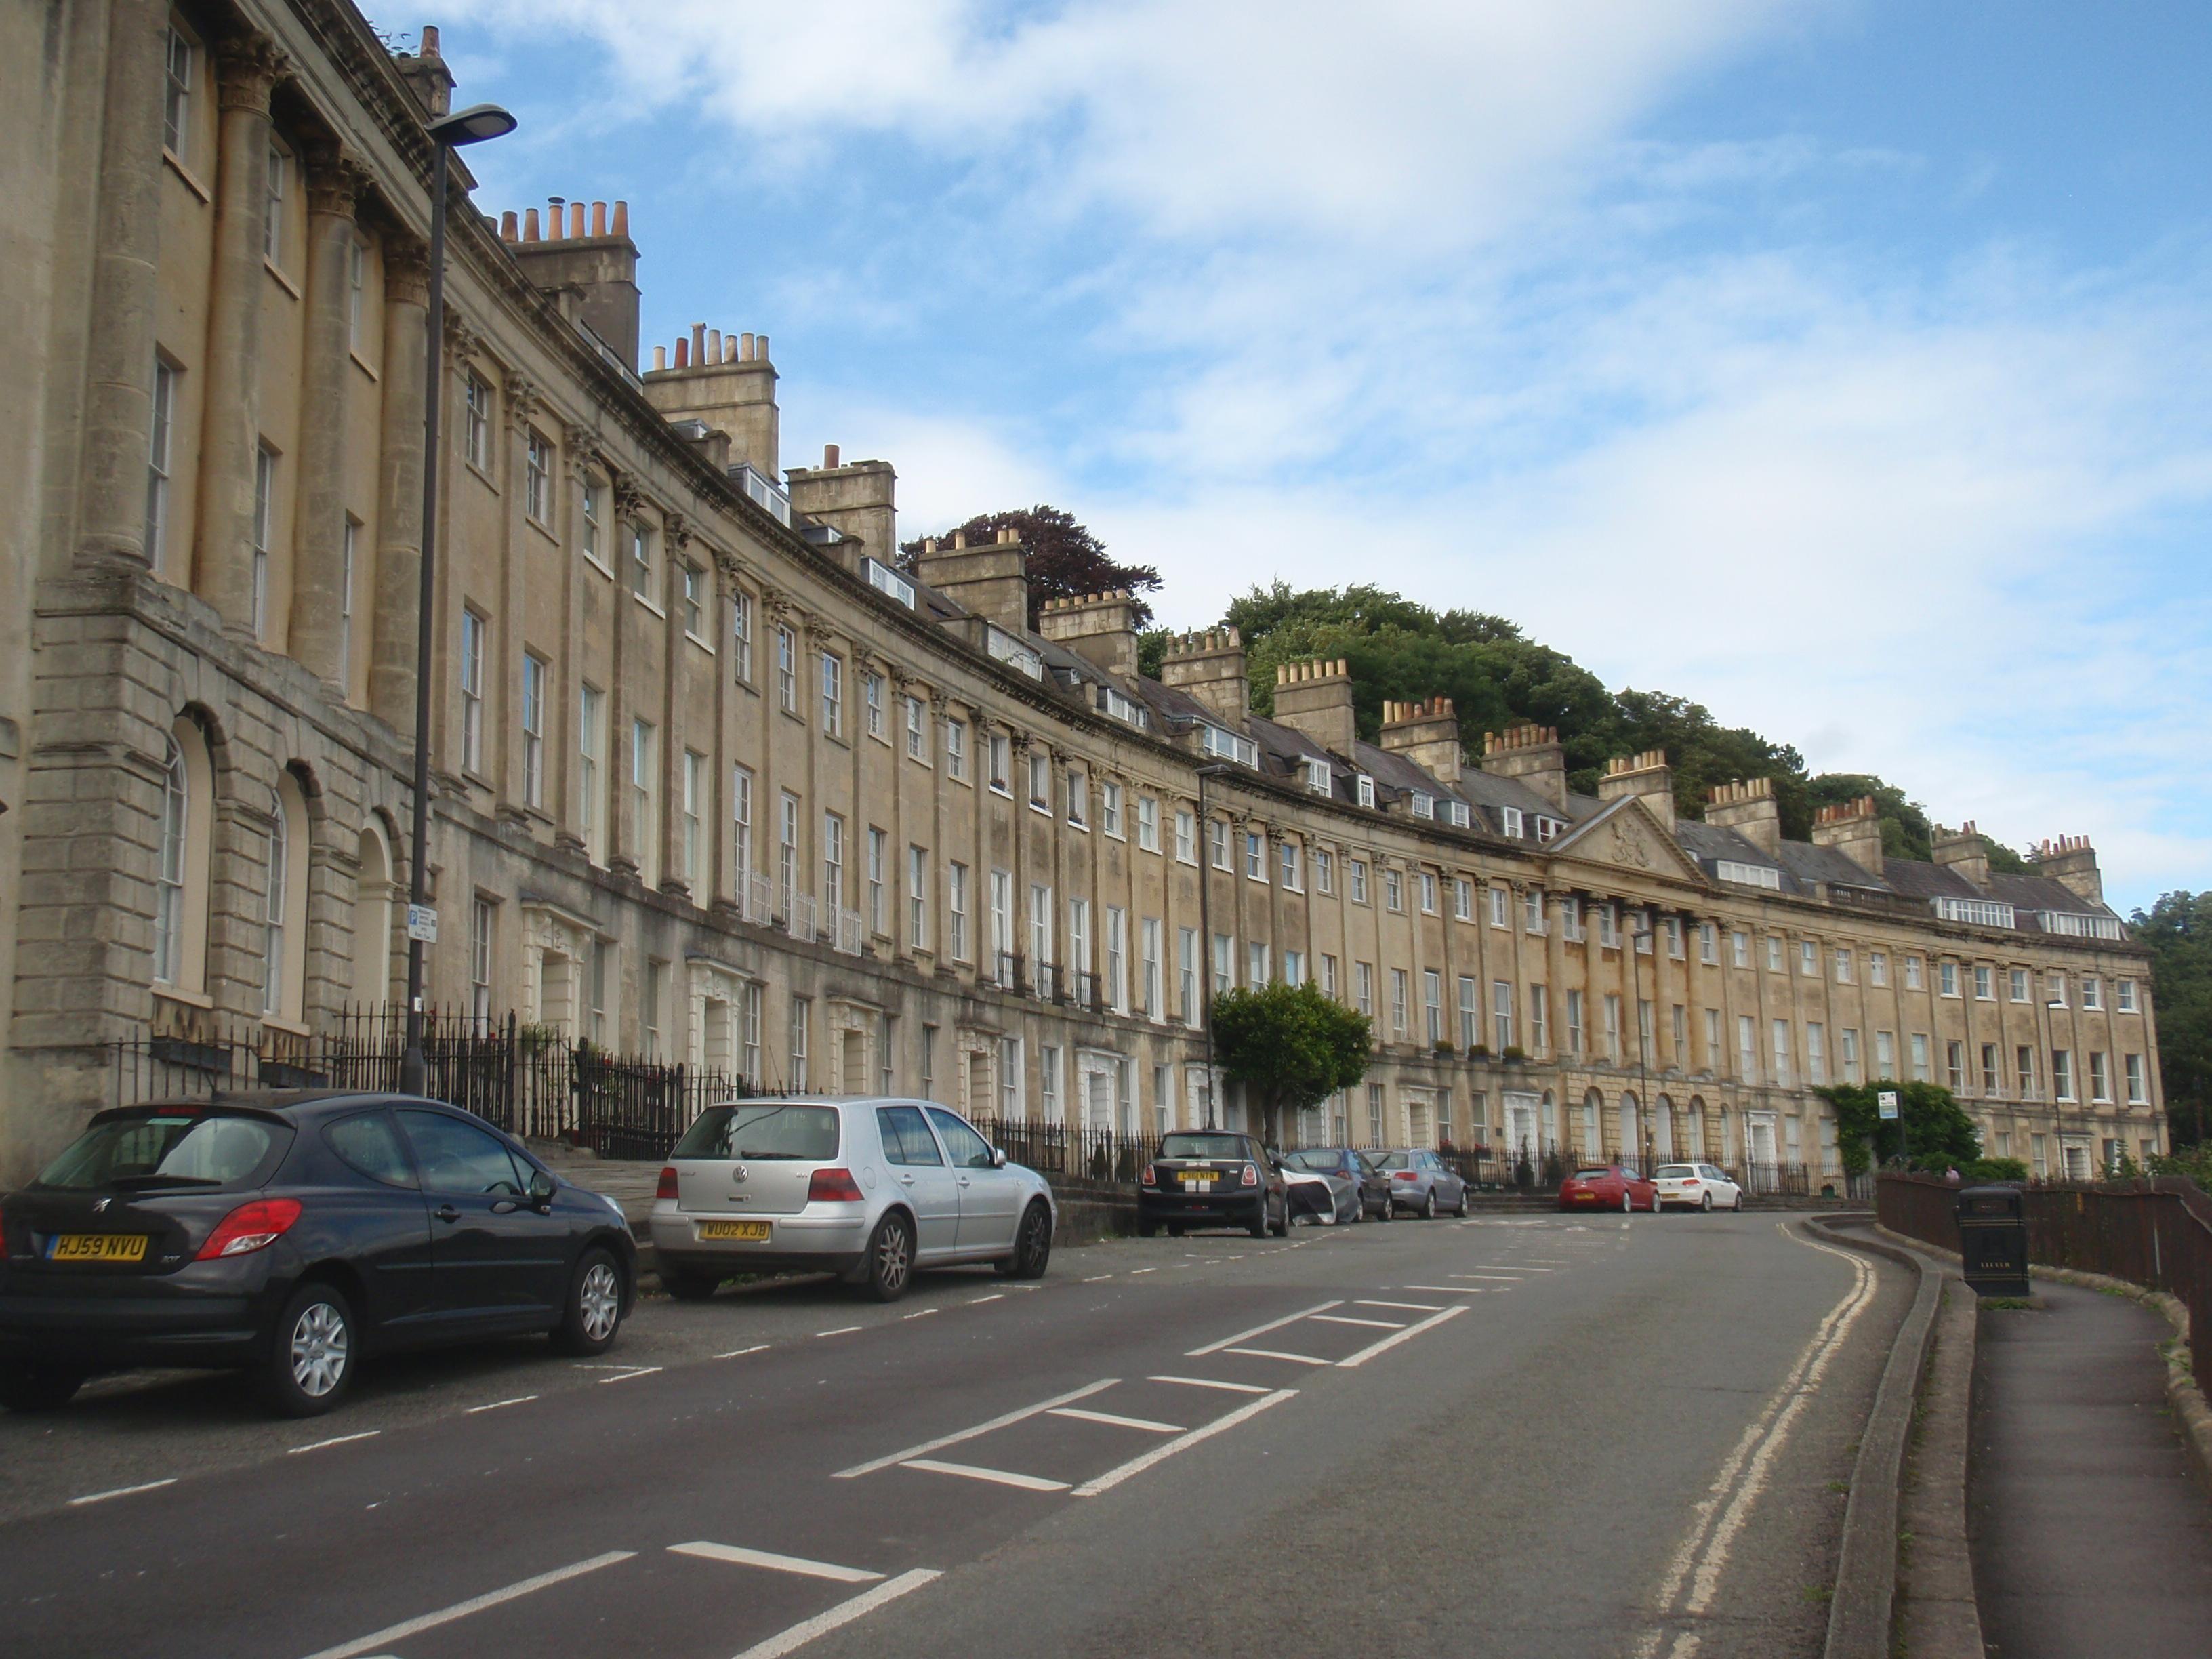 City of Bath